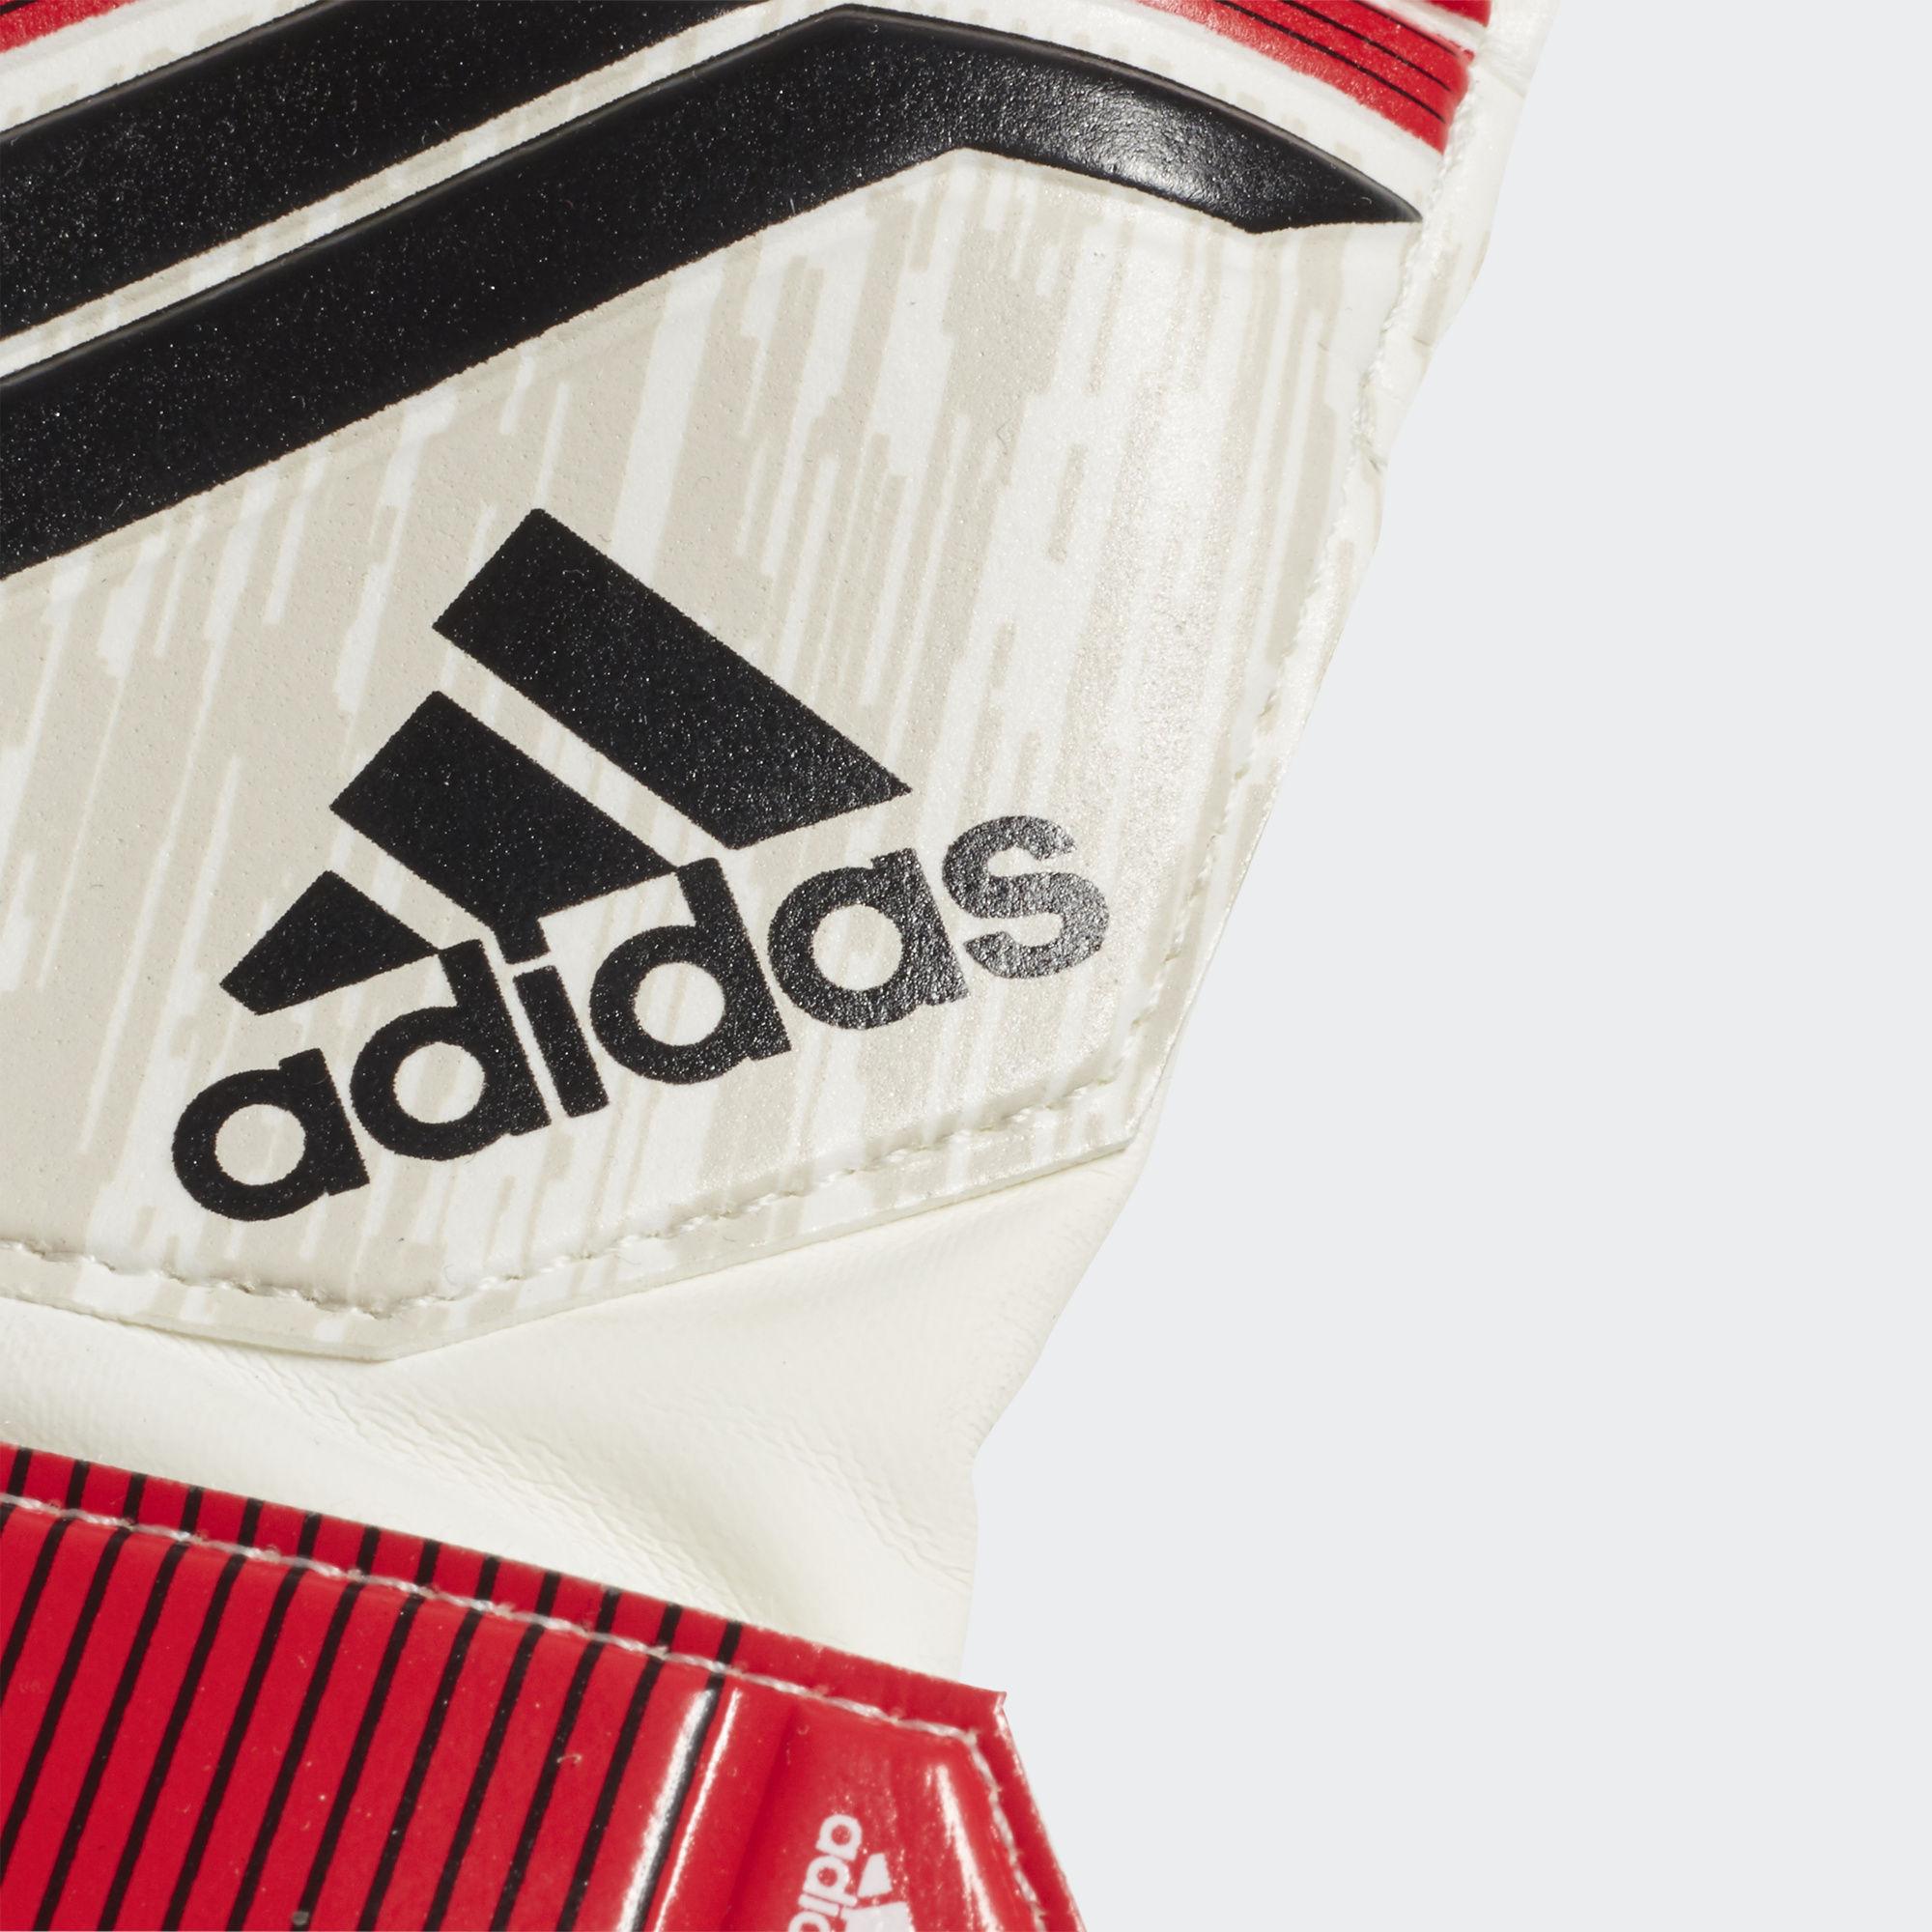 Вратарские перчатки Predator 18 Pro Junior K DN5622 adidas ... a8c698f655ca9